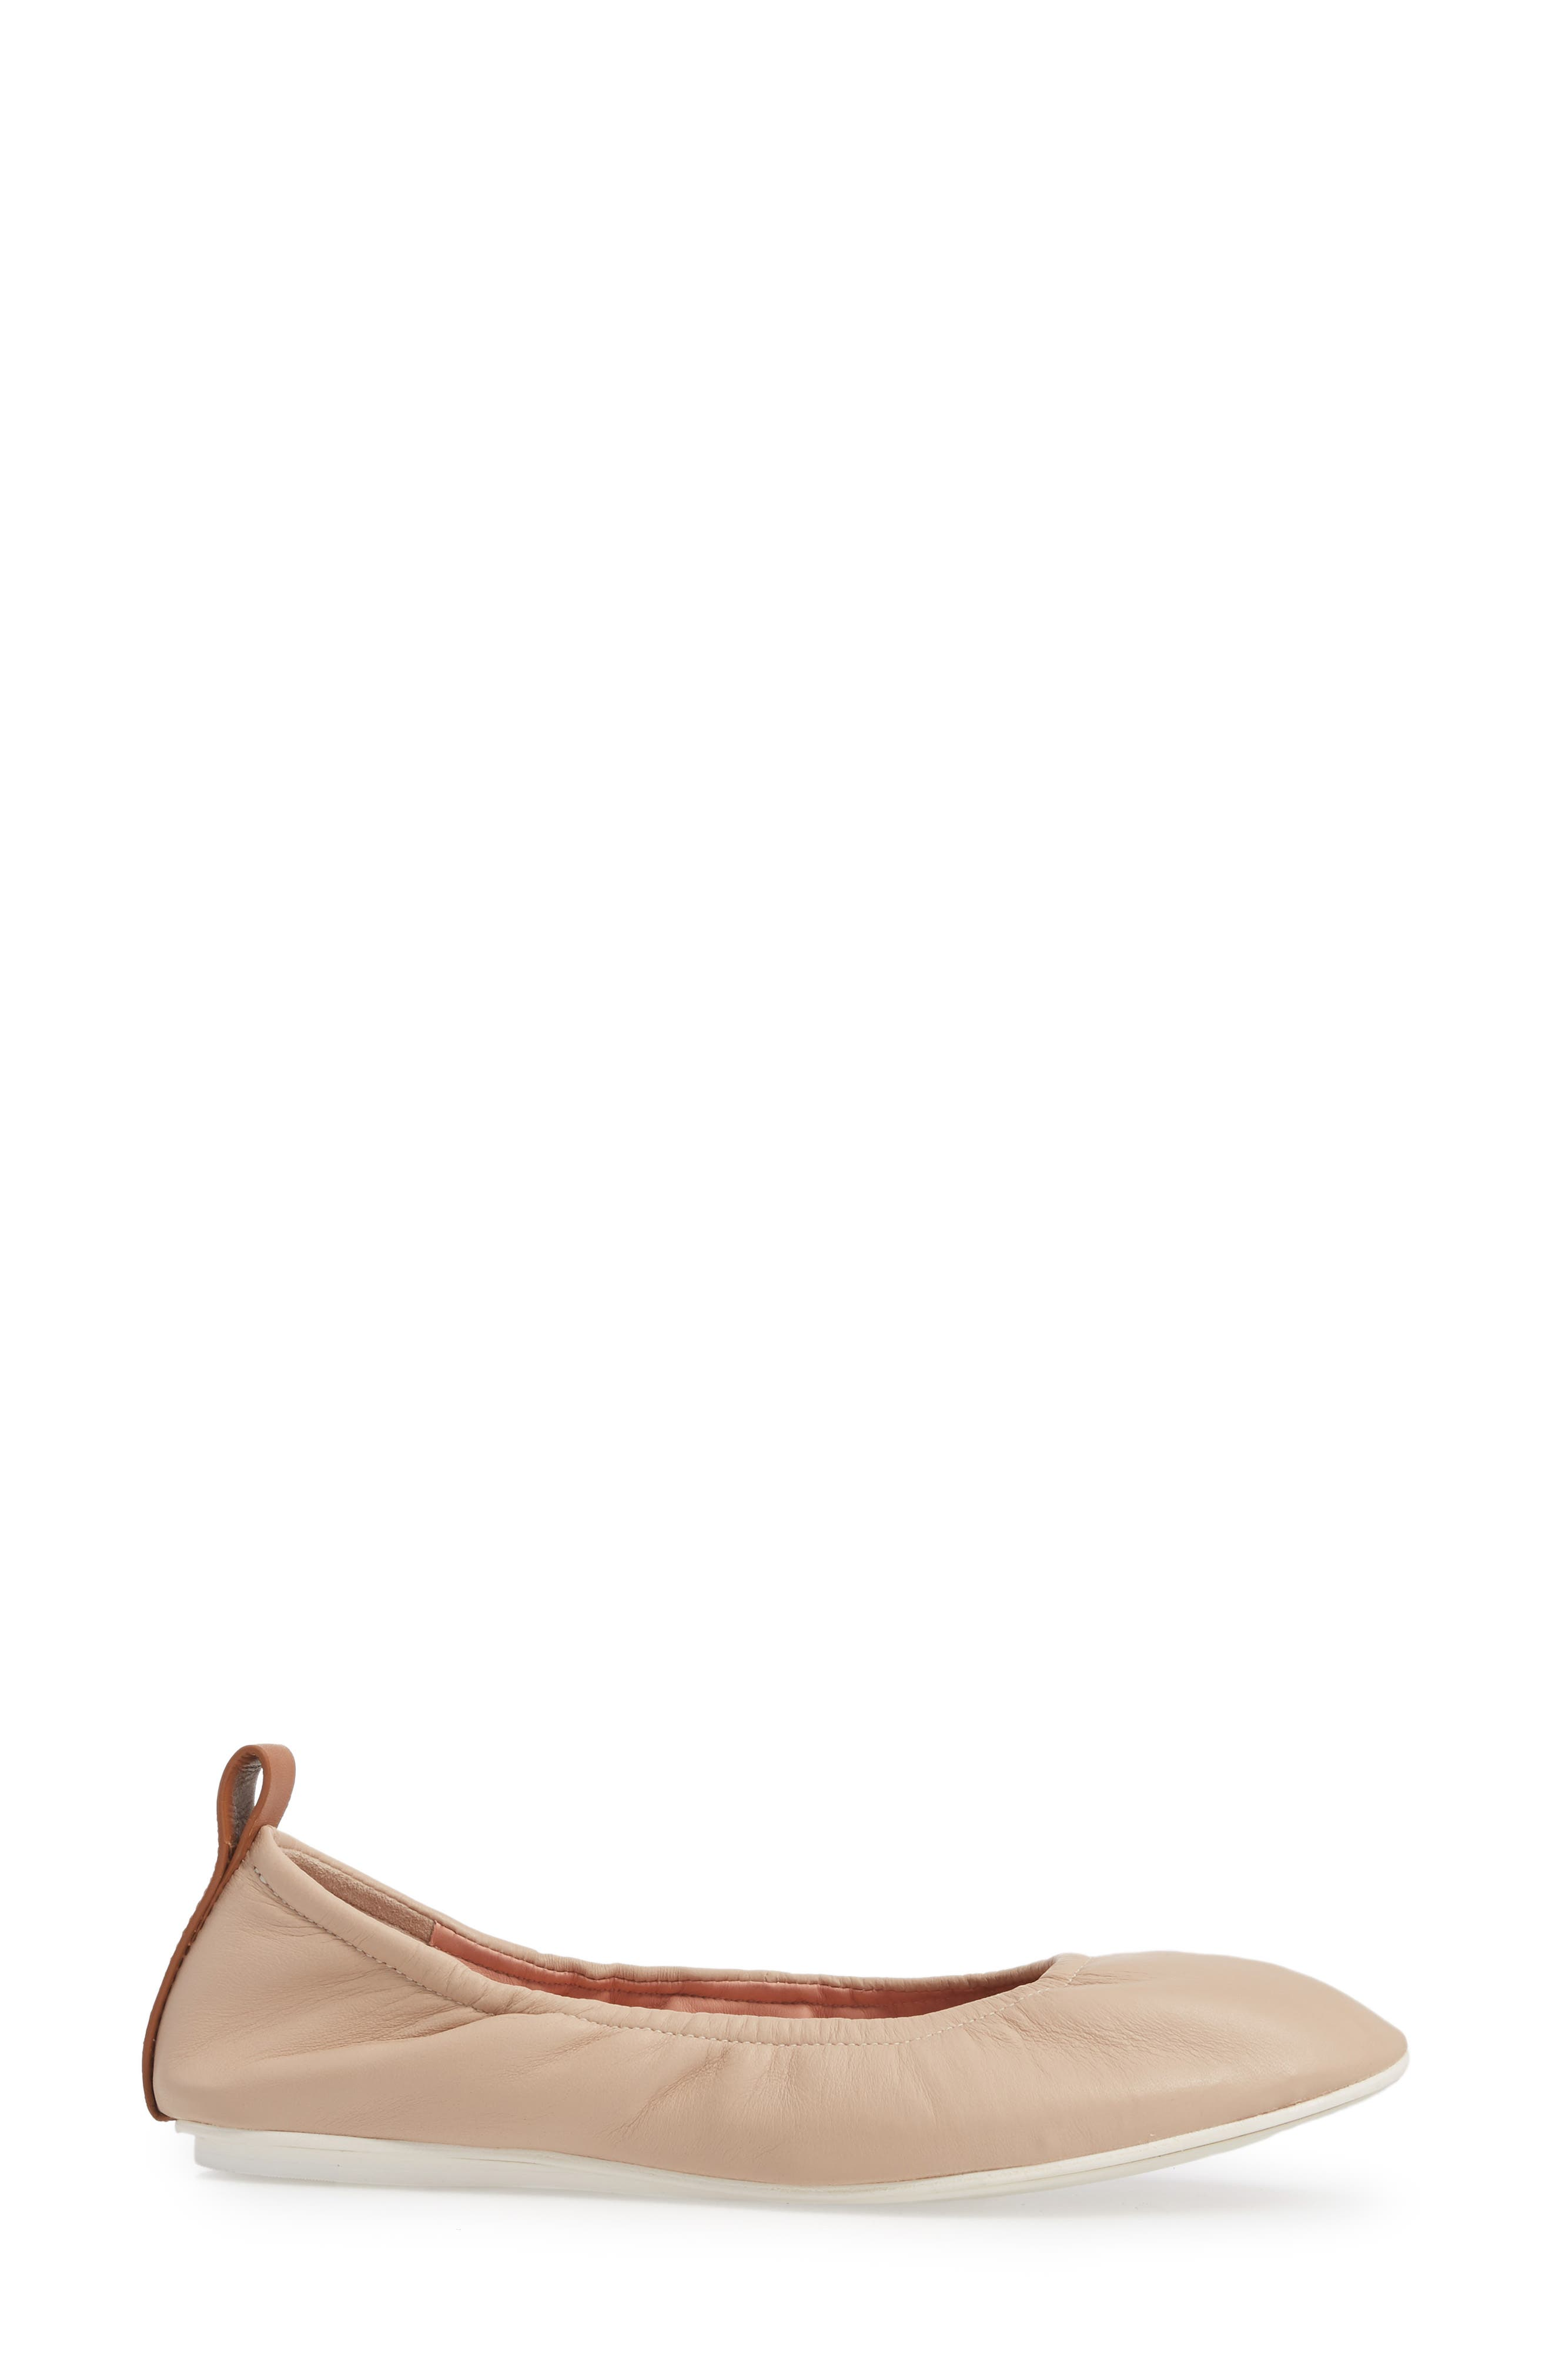 Carola Ballet Flat,                             Alternate thumbnail 3, color,                             Nude